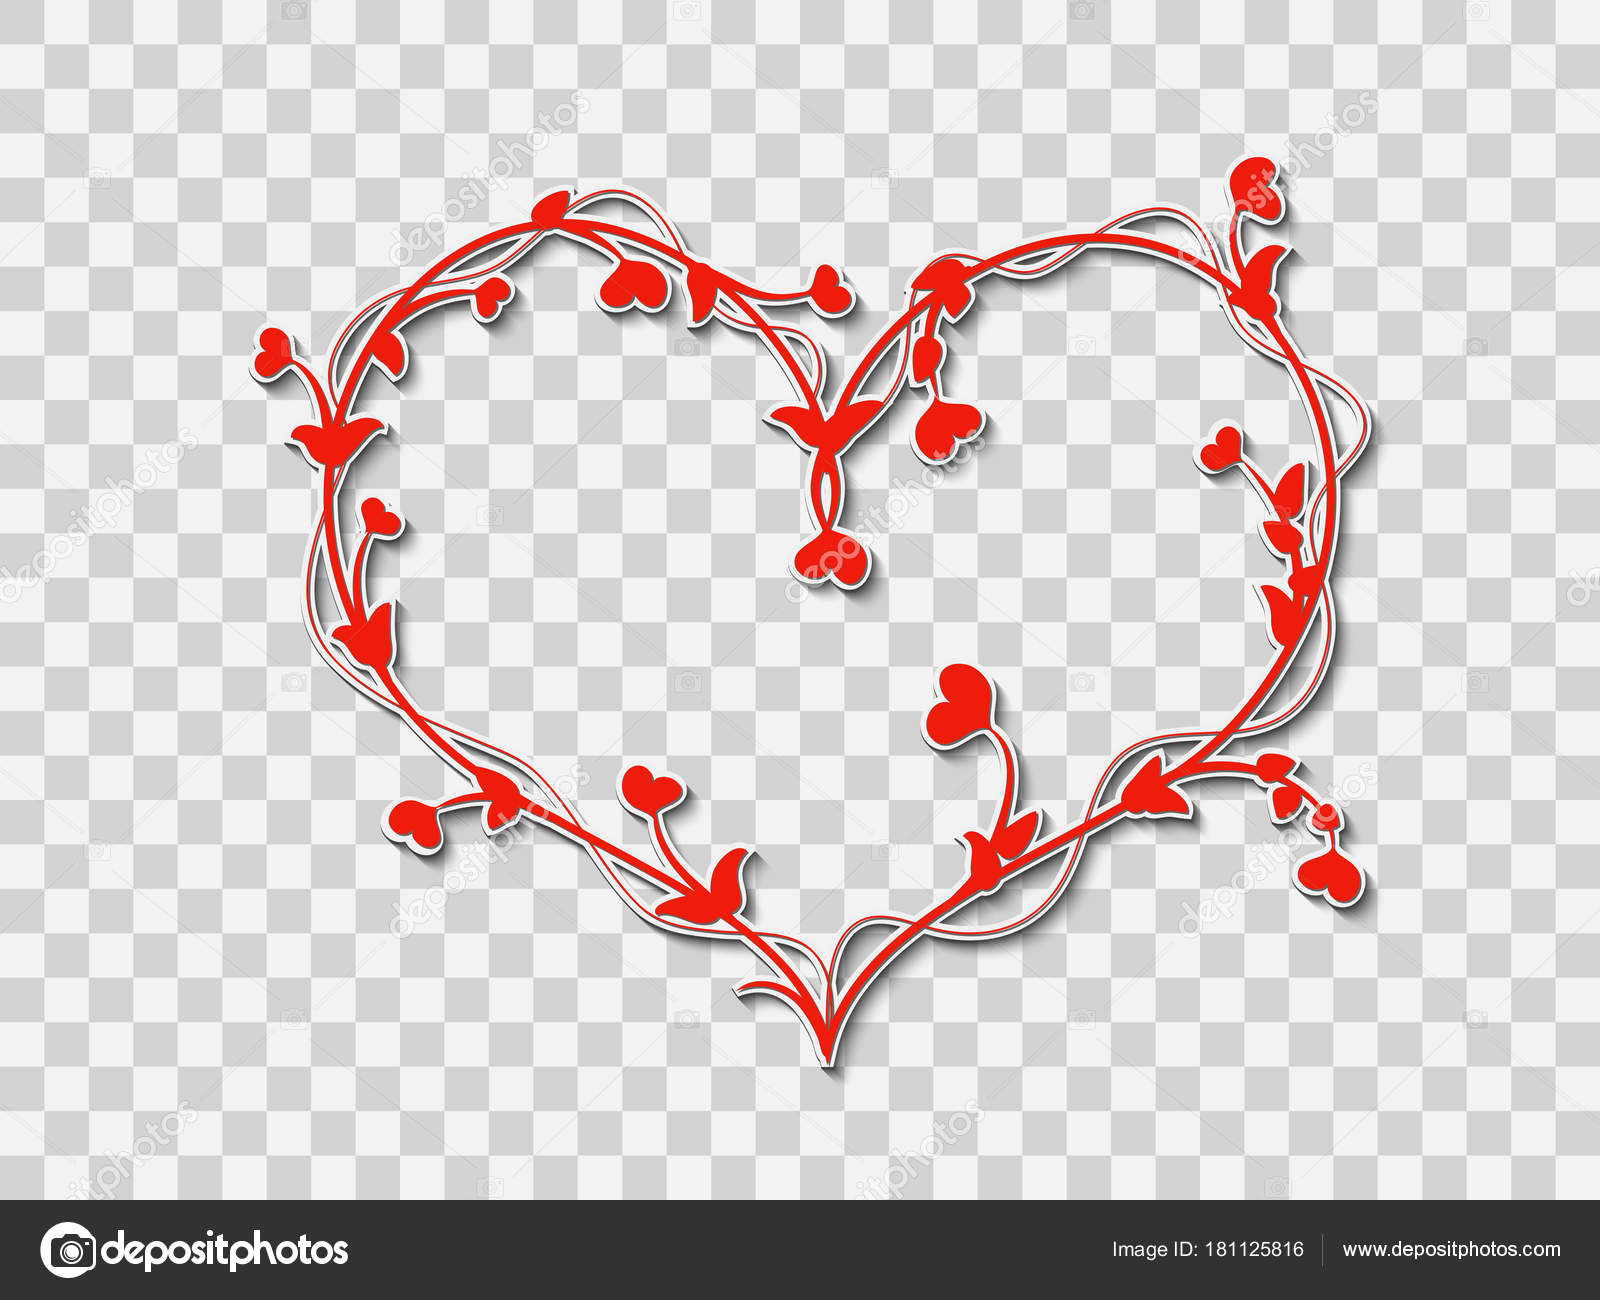 Corazón Rojo Sobre Un Fondo Transparente